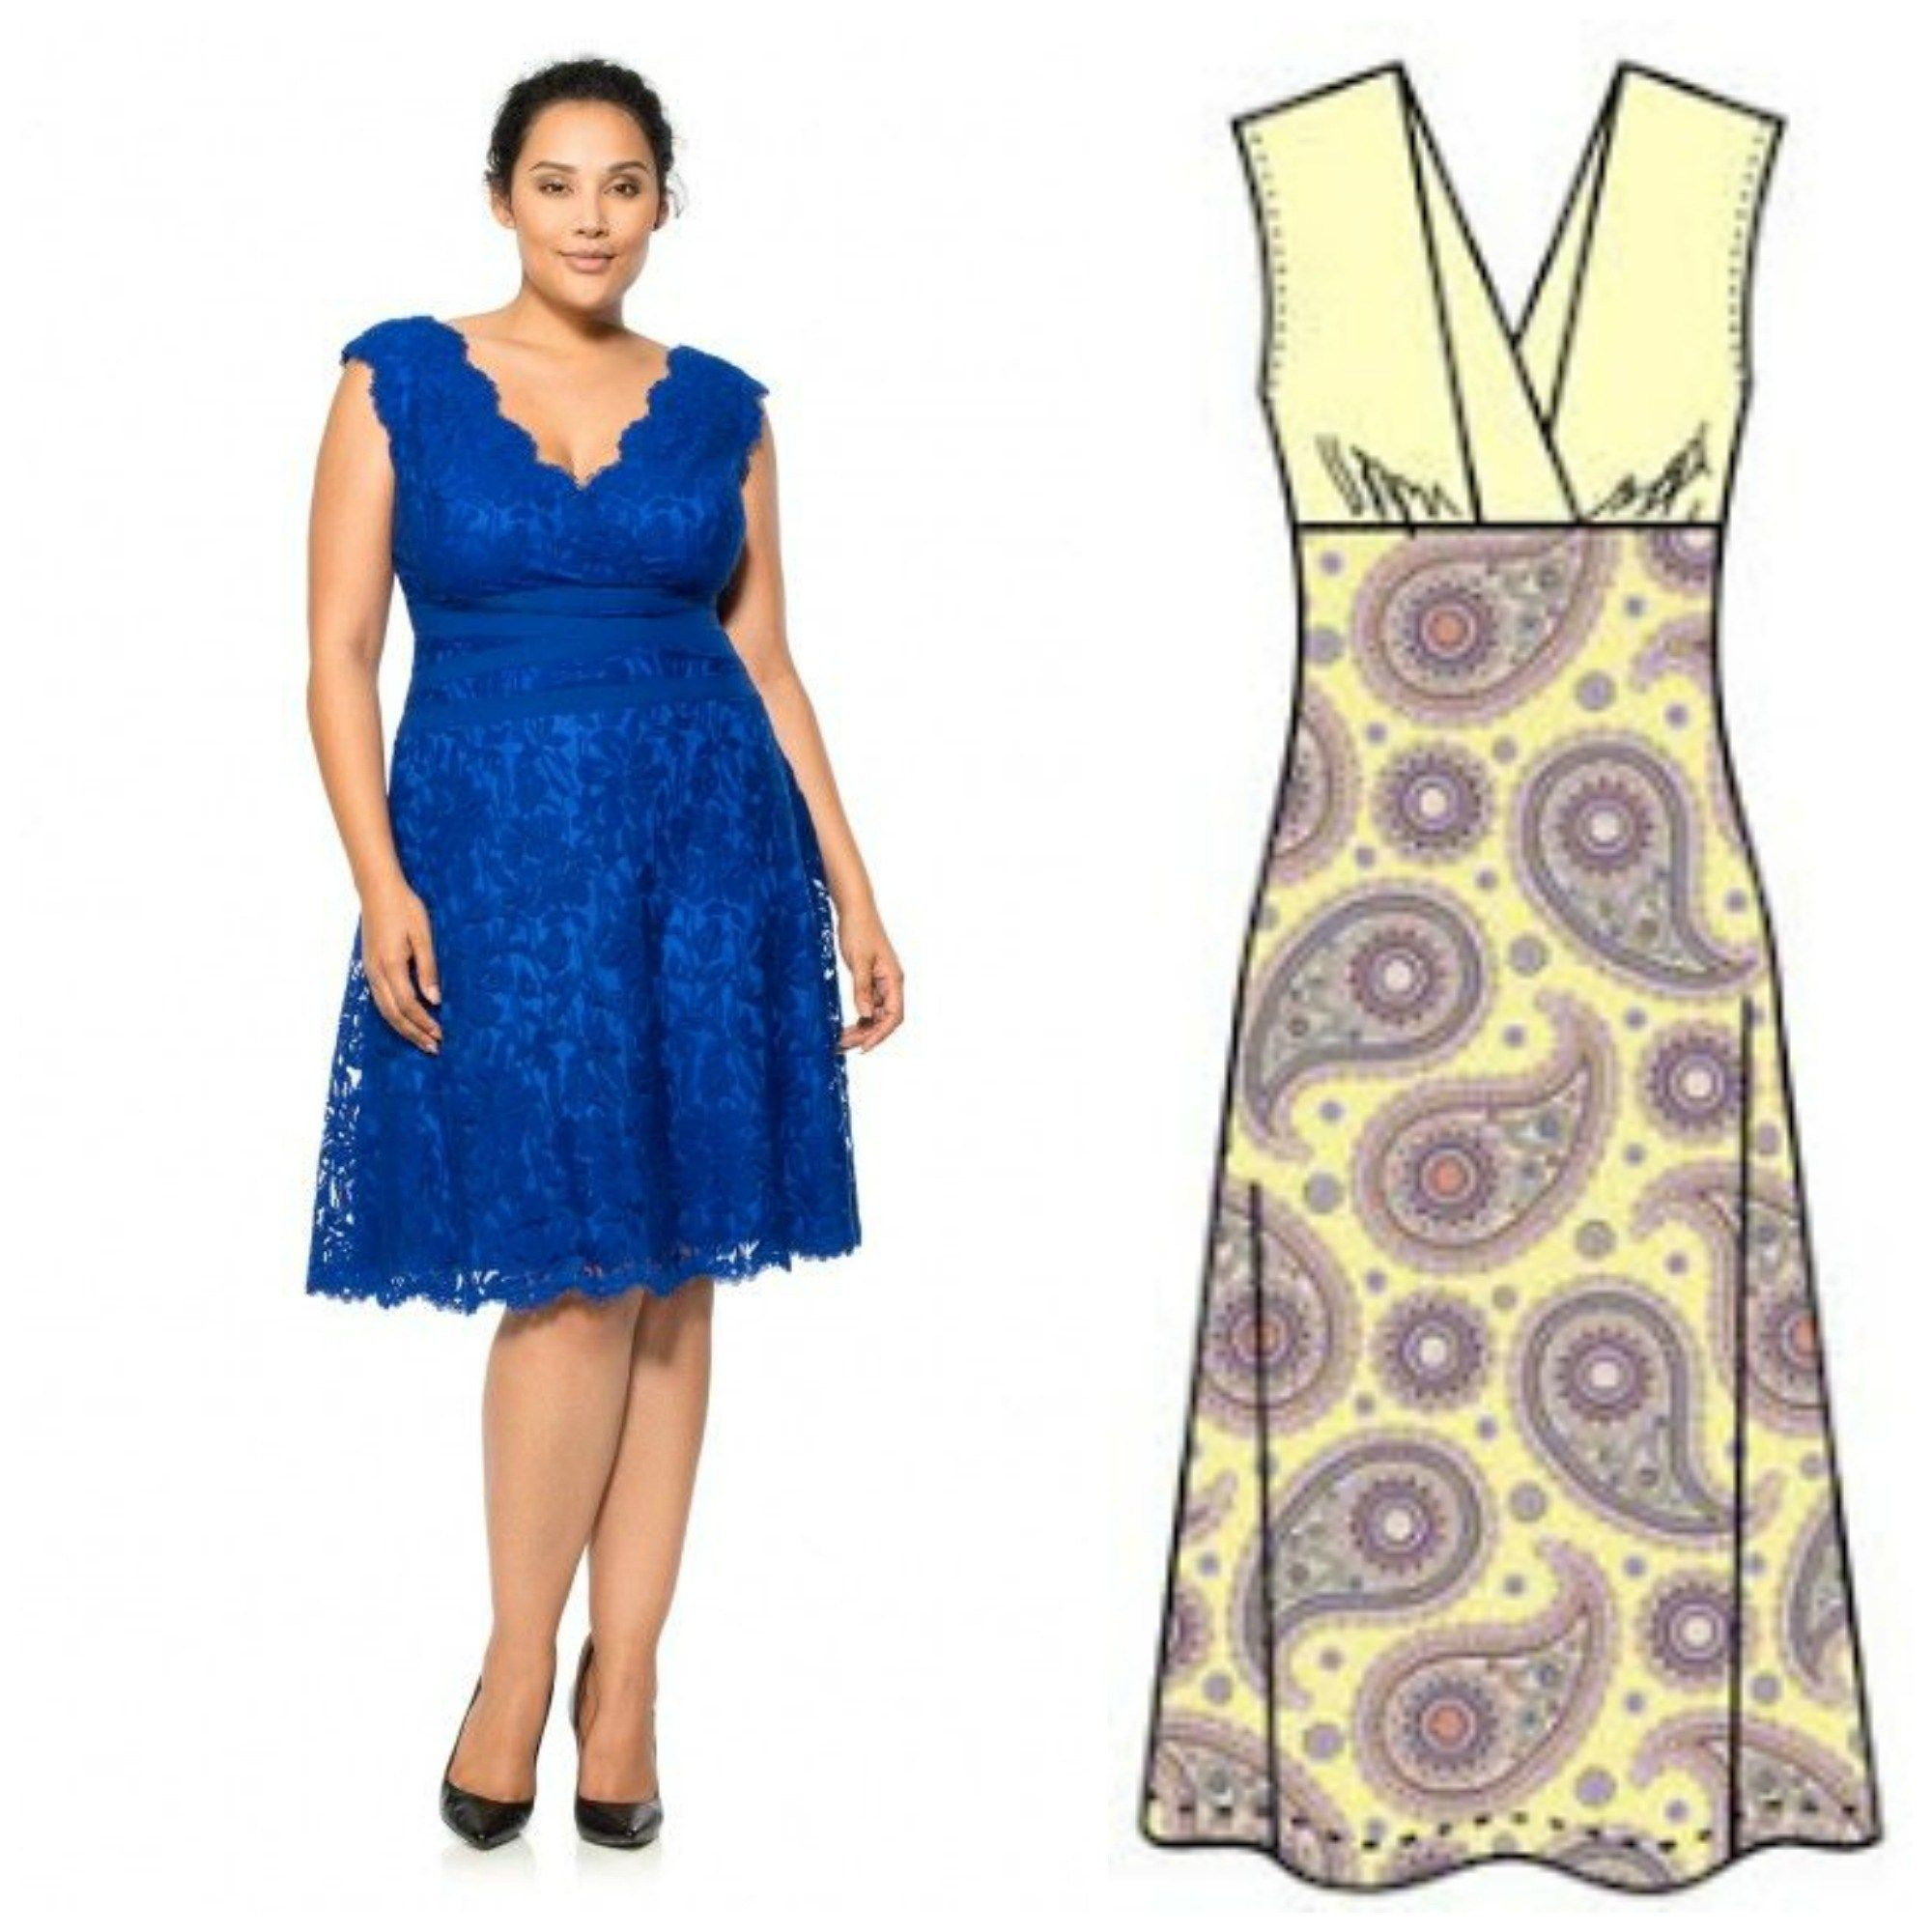 V Neck Dress Pattern Free | Sew neat! | Pinterest | Dress patterns ...